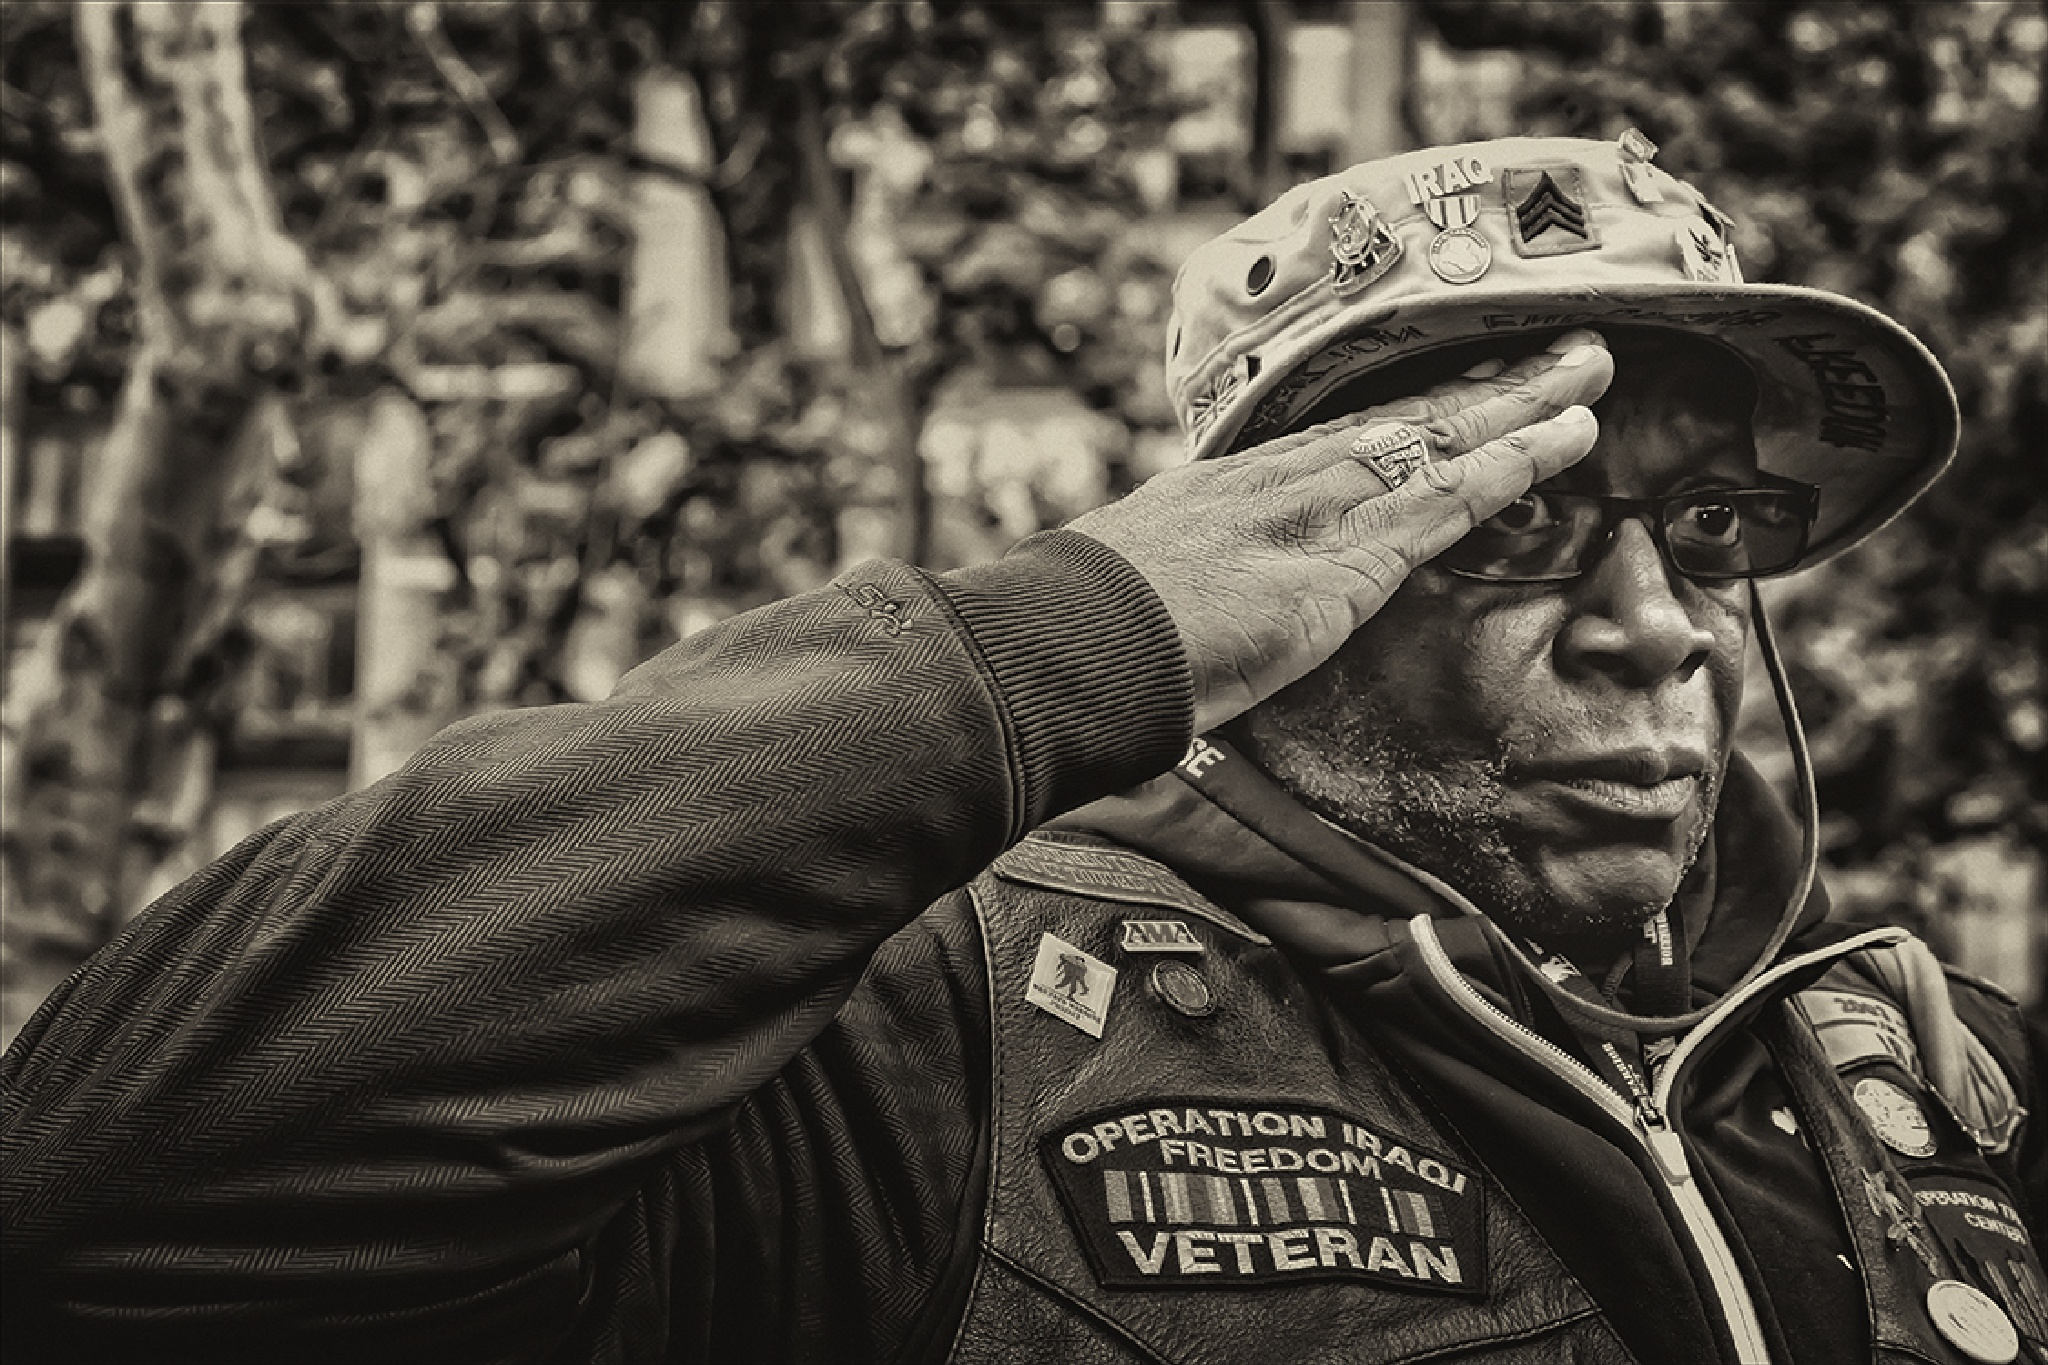 Veterans Day NYC 2015 by robertullmann